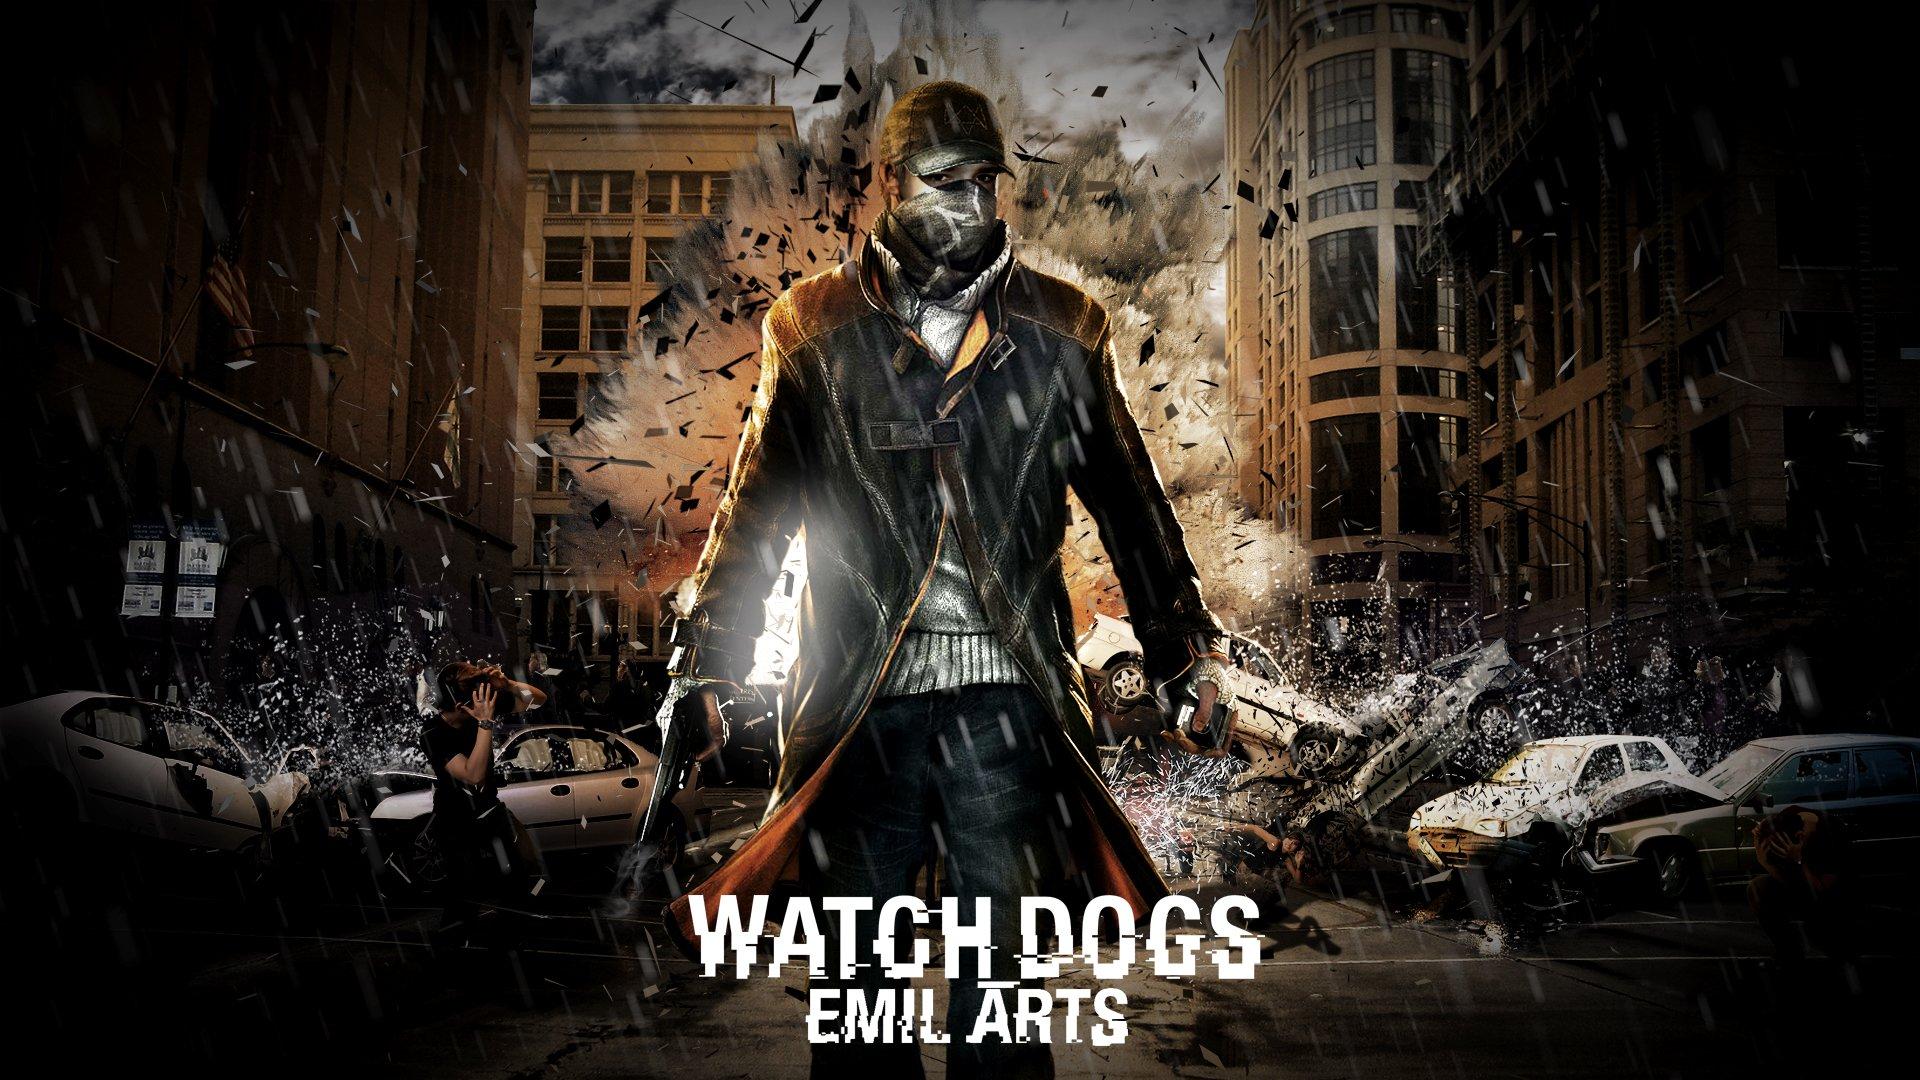 watch dogs  Art, ubisoft, fanart  № 2644231 загрузить